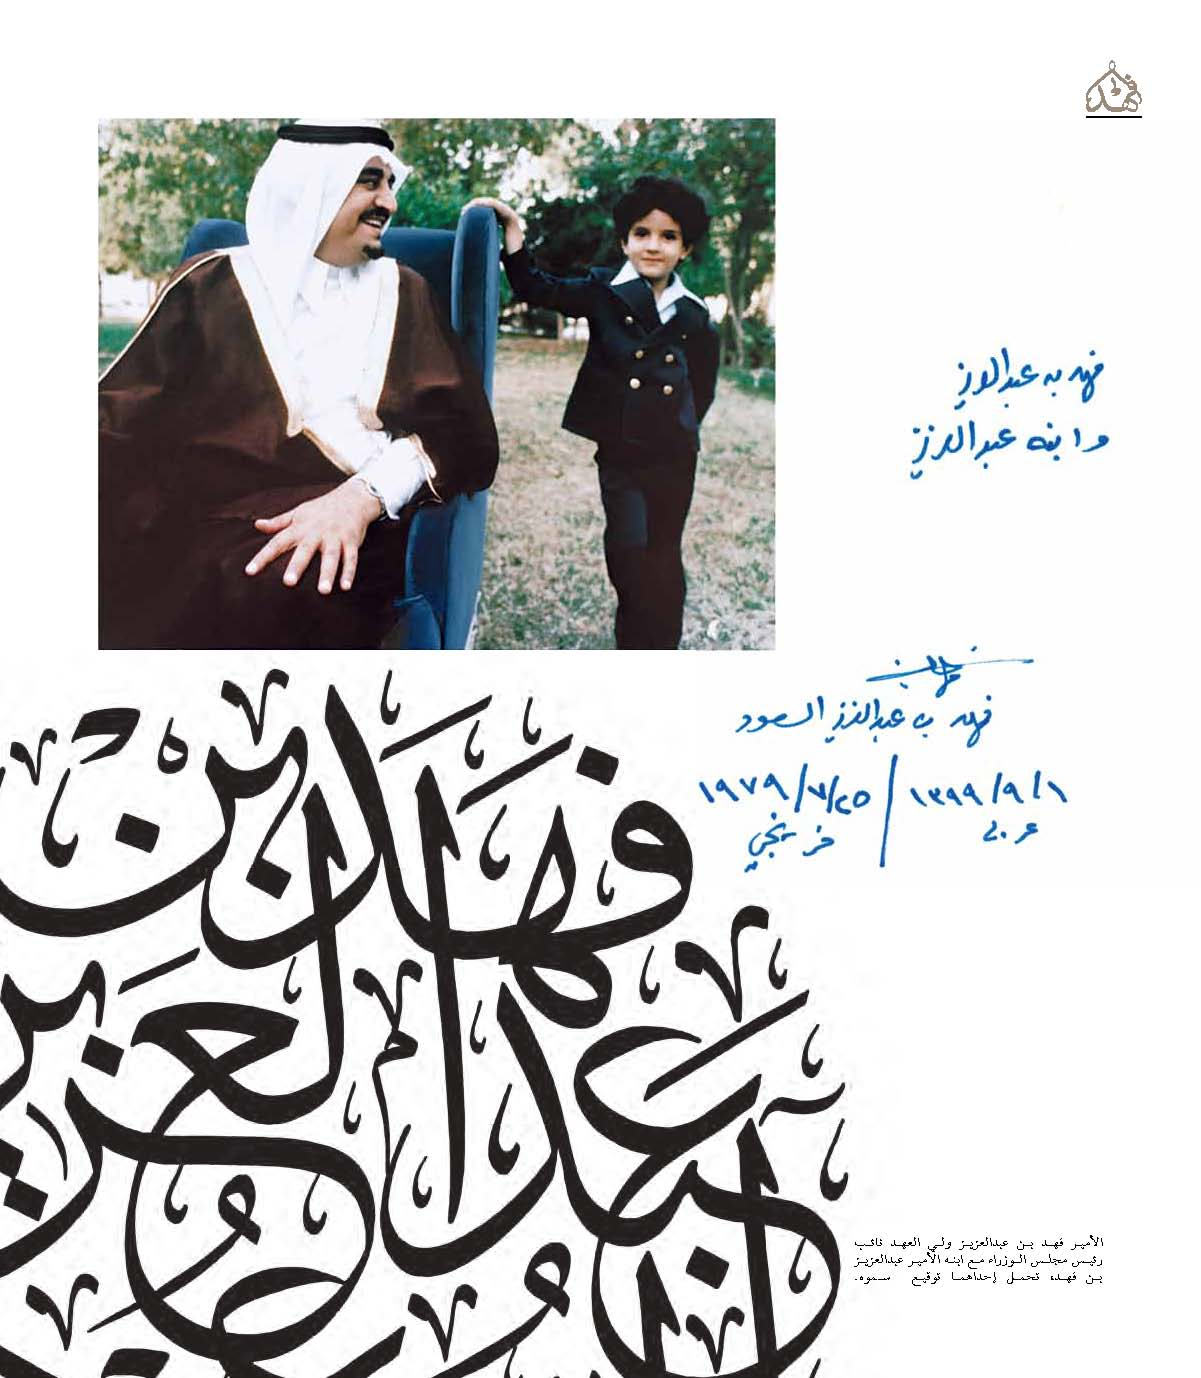 "صور نادرة للملك فهد في ""كتاب"" 2311ec5d-0aa3-4f8f-9f43-916c1a5d4223"